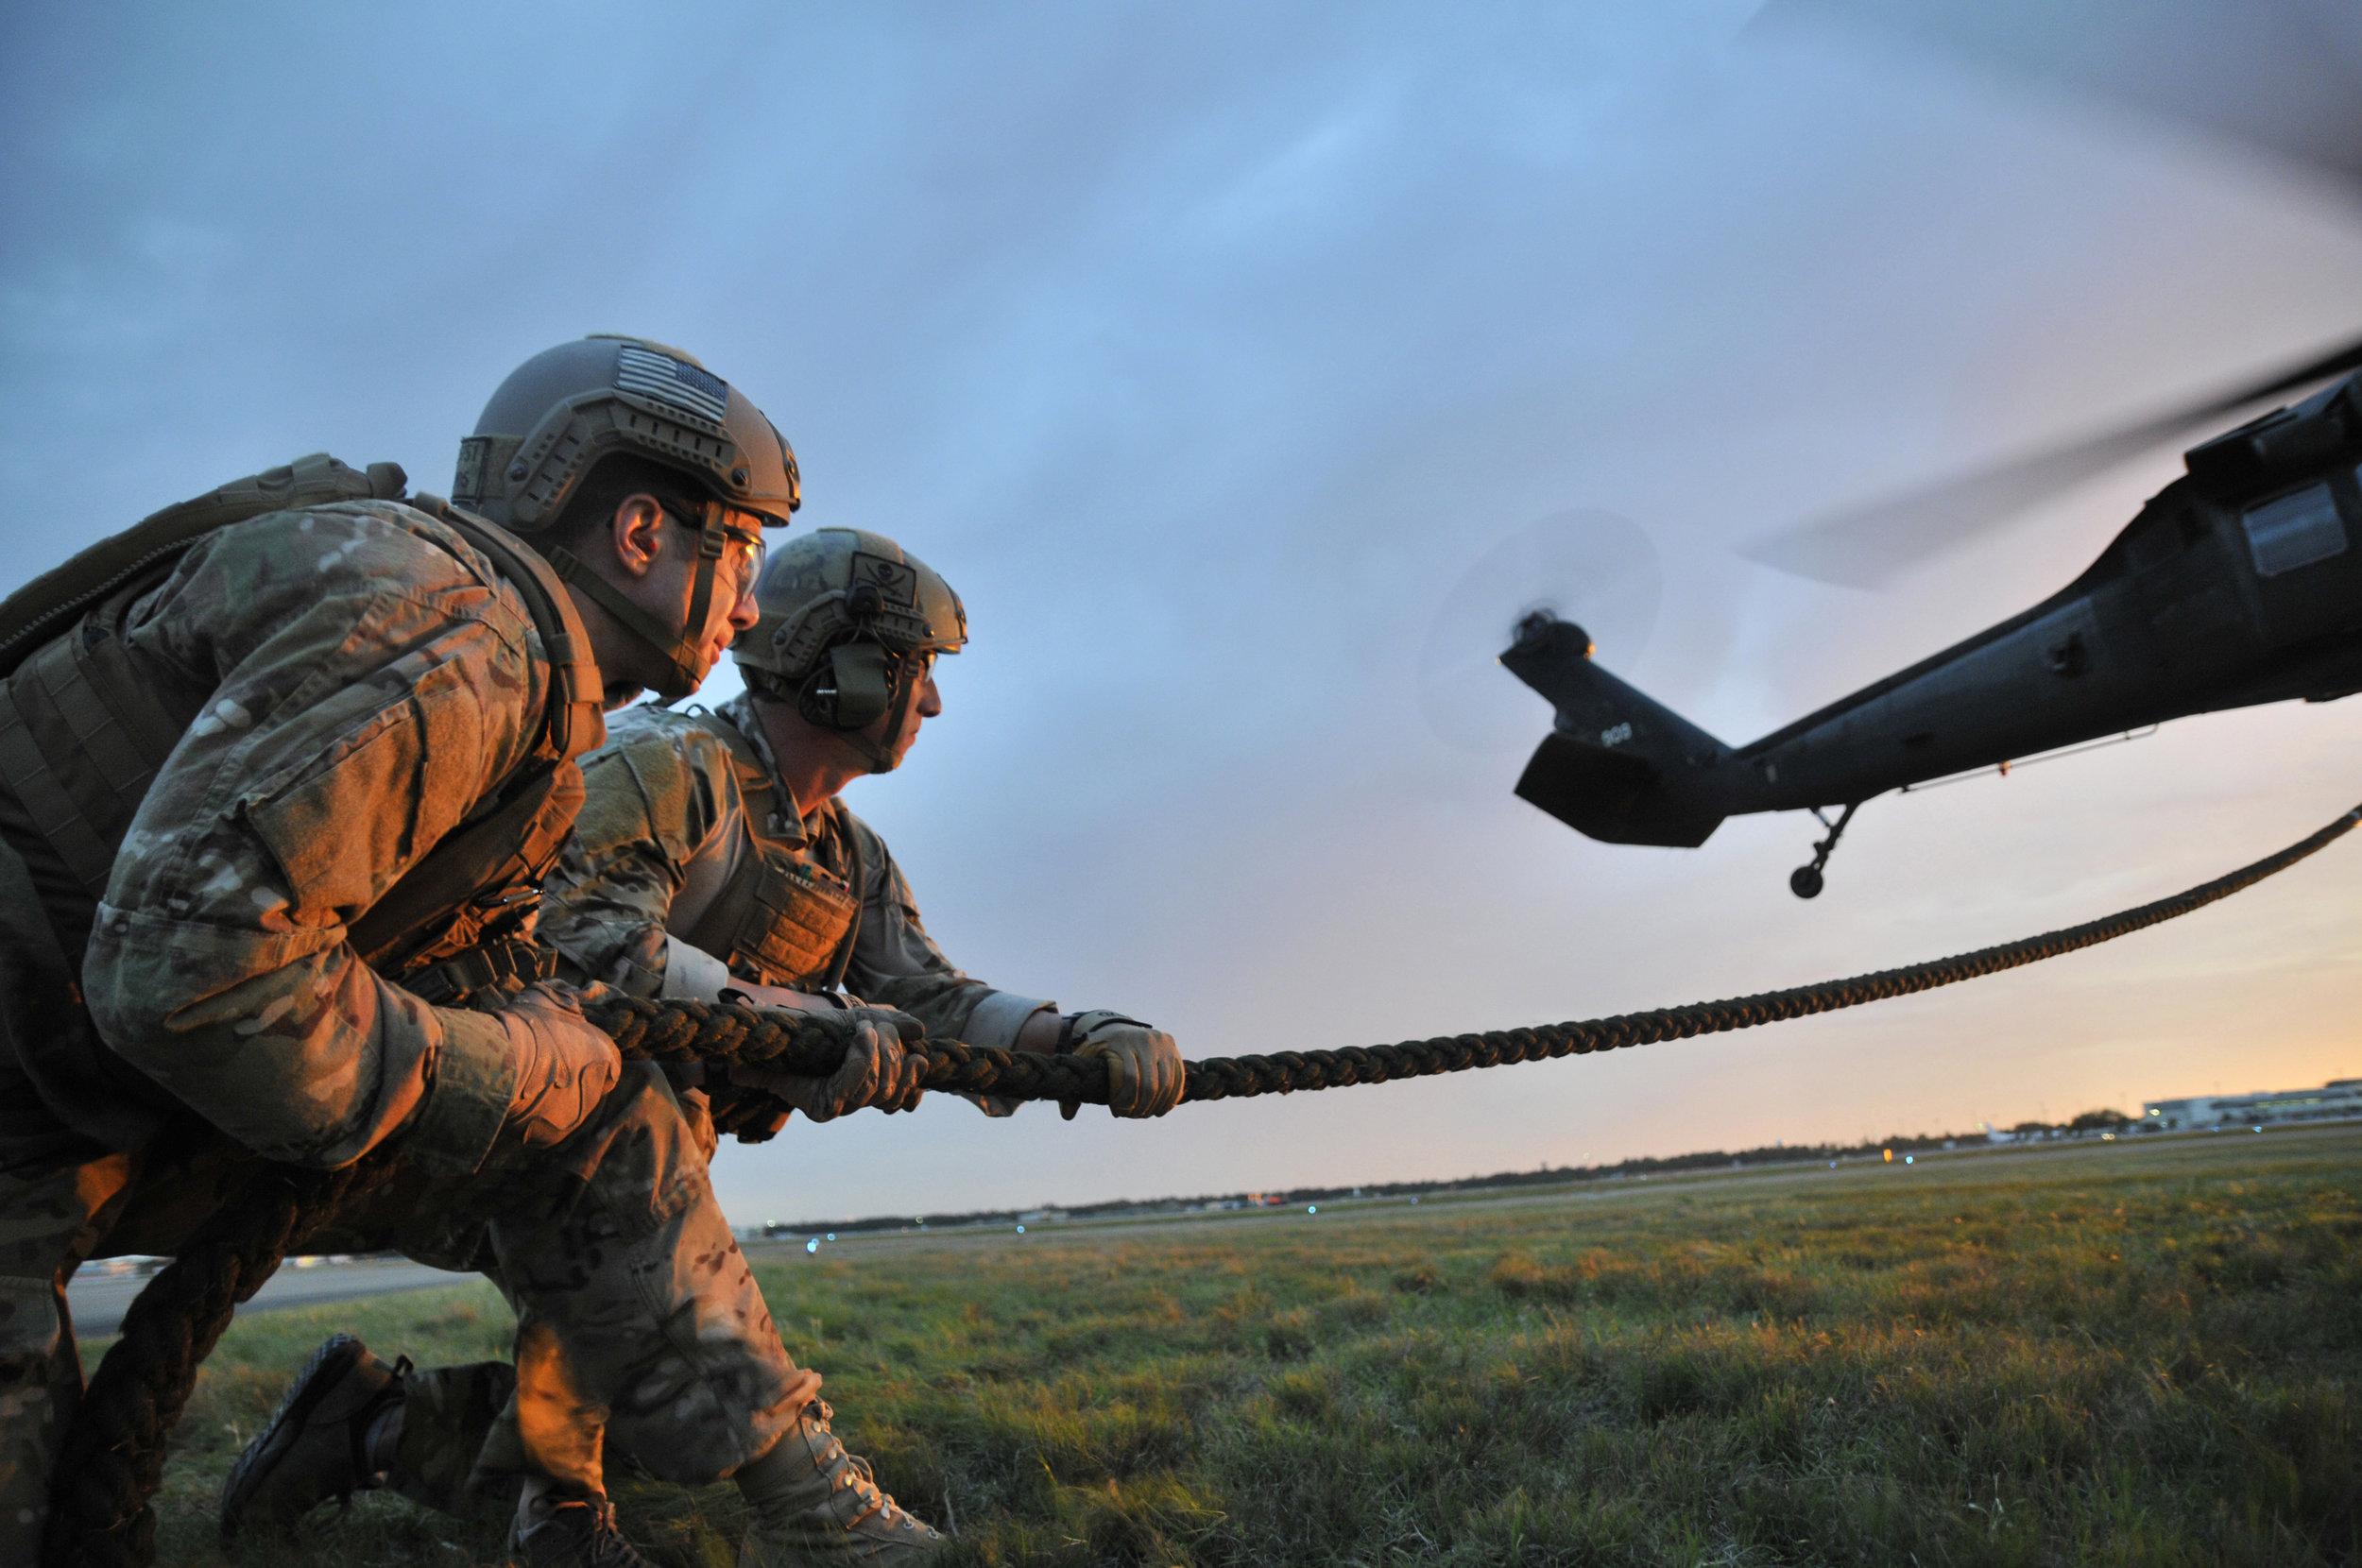 US Army National Guard Photo by Staff Sergeant Shane Hamann